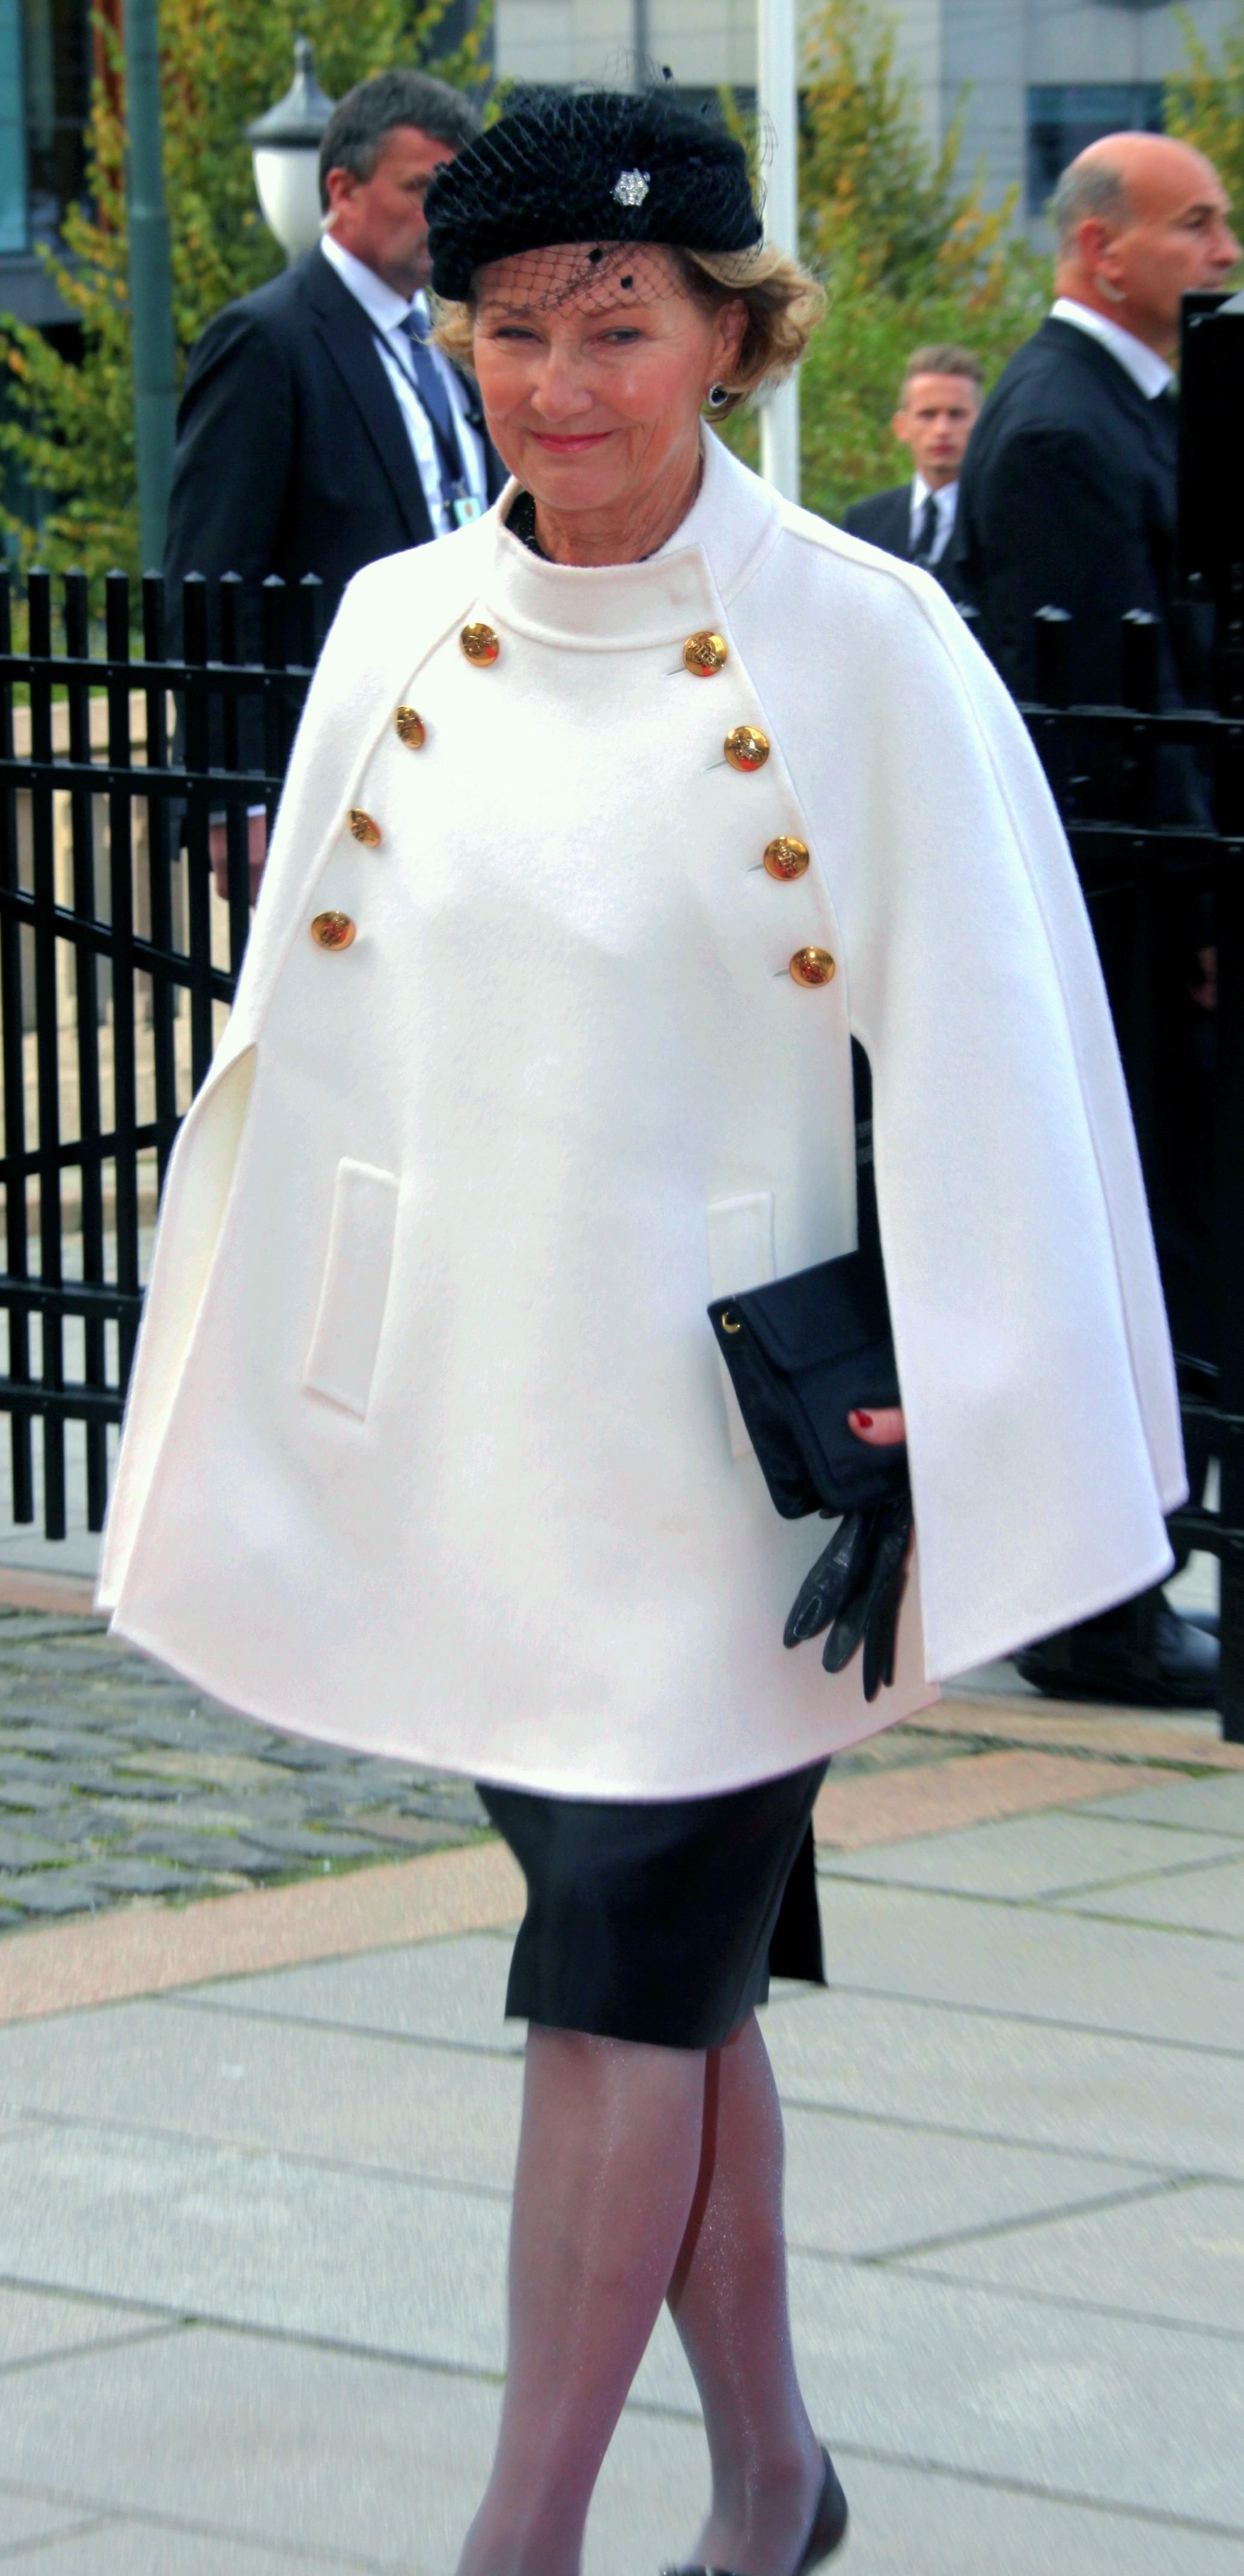 Sonja Haraldsen. Reina de Noruega - Página 11 Ste_the_opening__31294391-e1381333626606